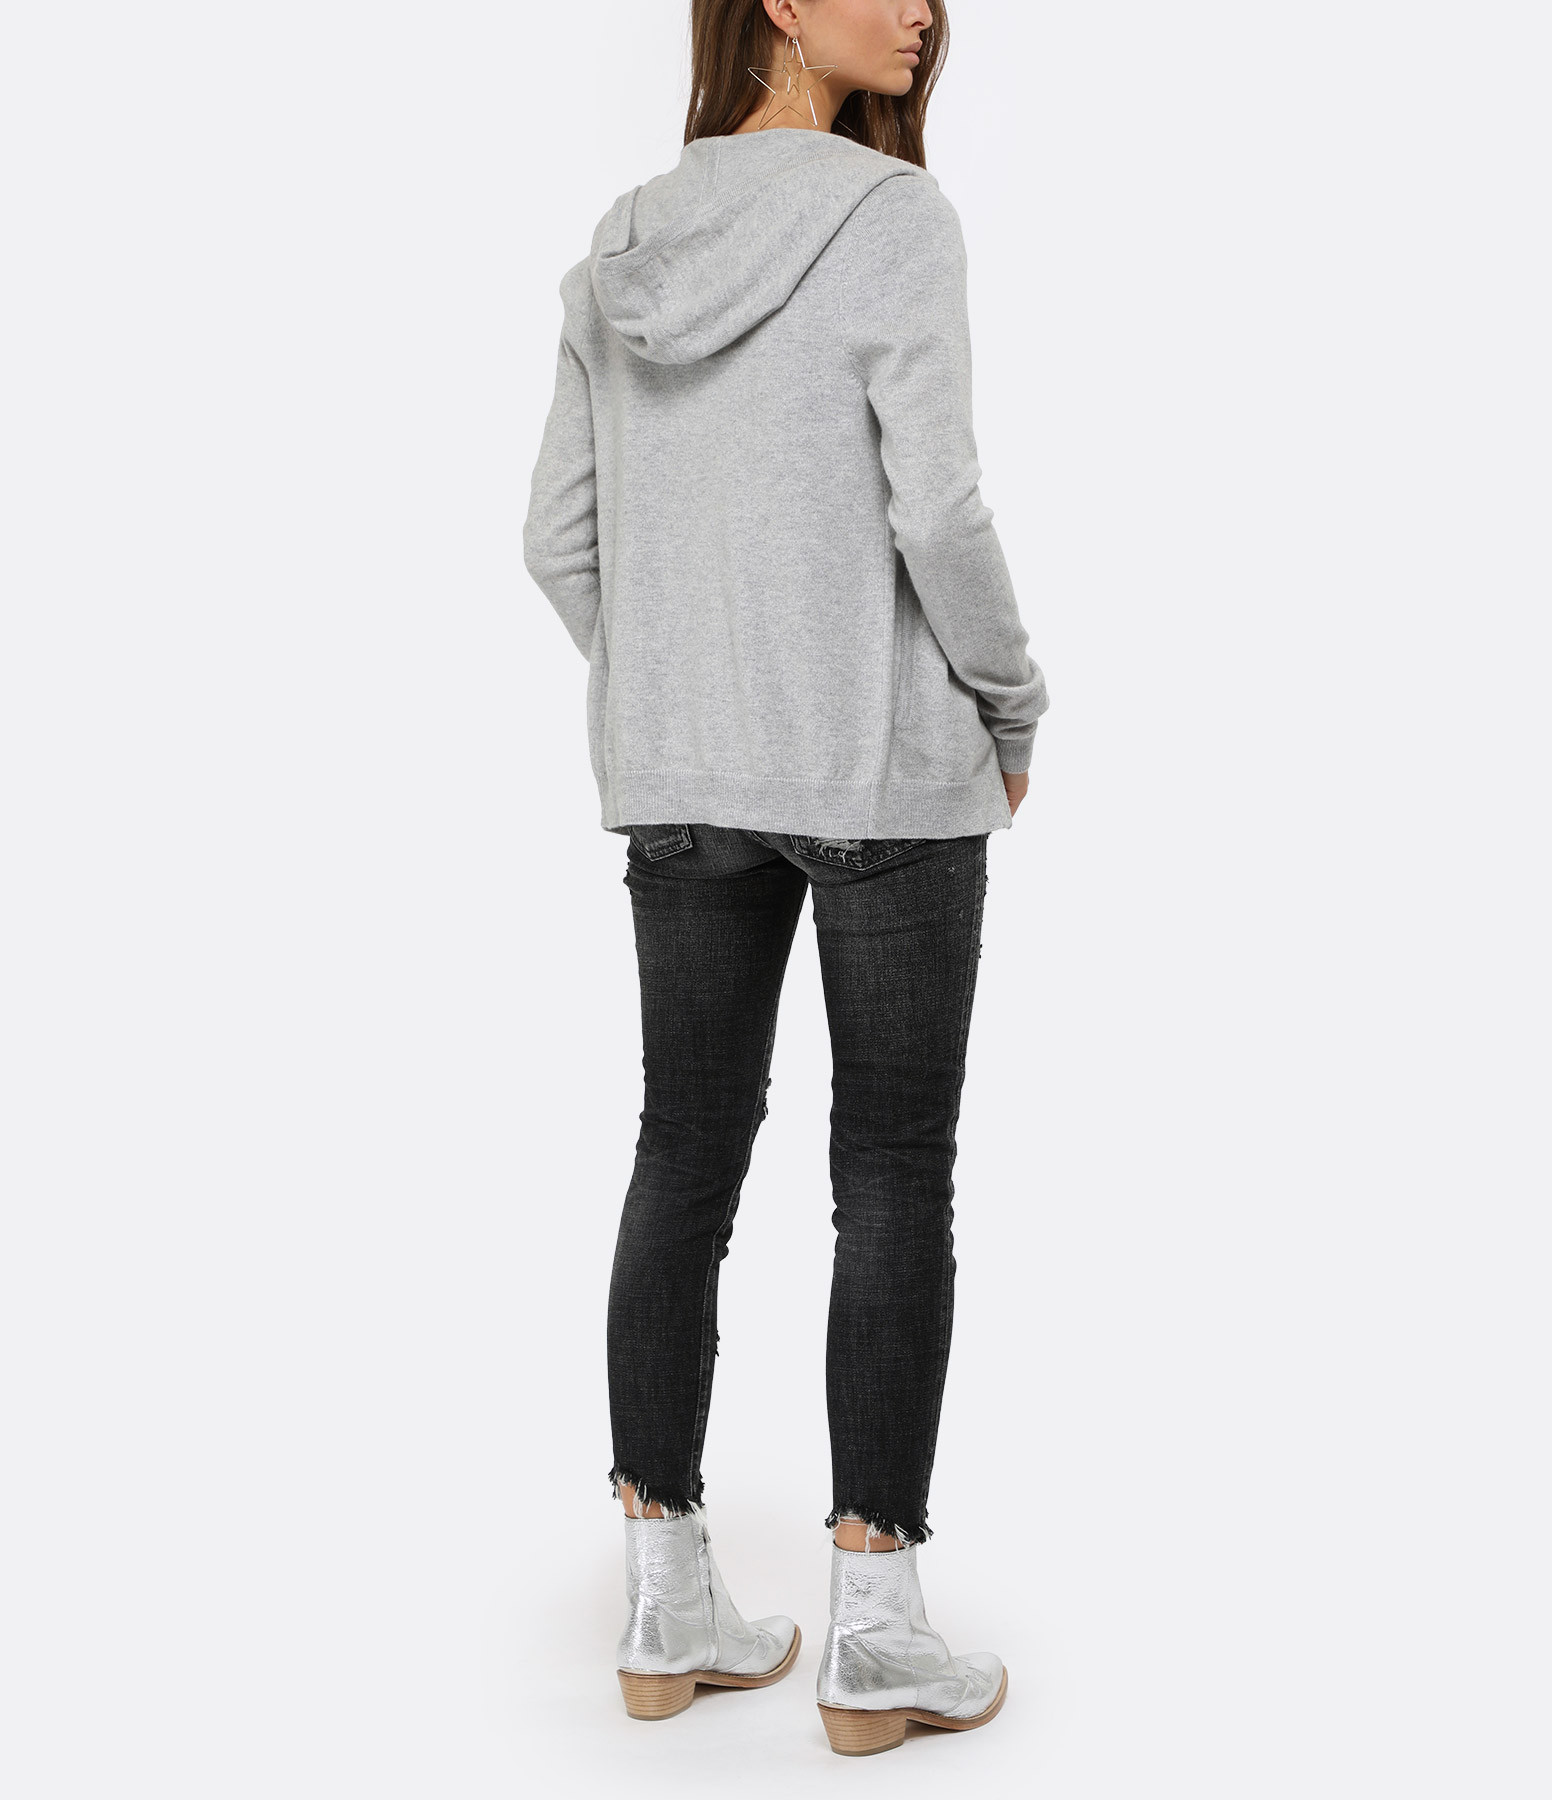 ERIC BOMPARD - Sweatshirt Hoodie Cintré Gris Frost